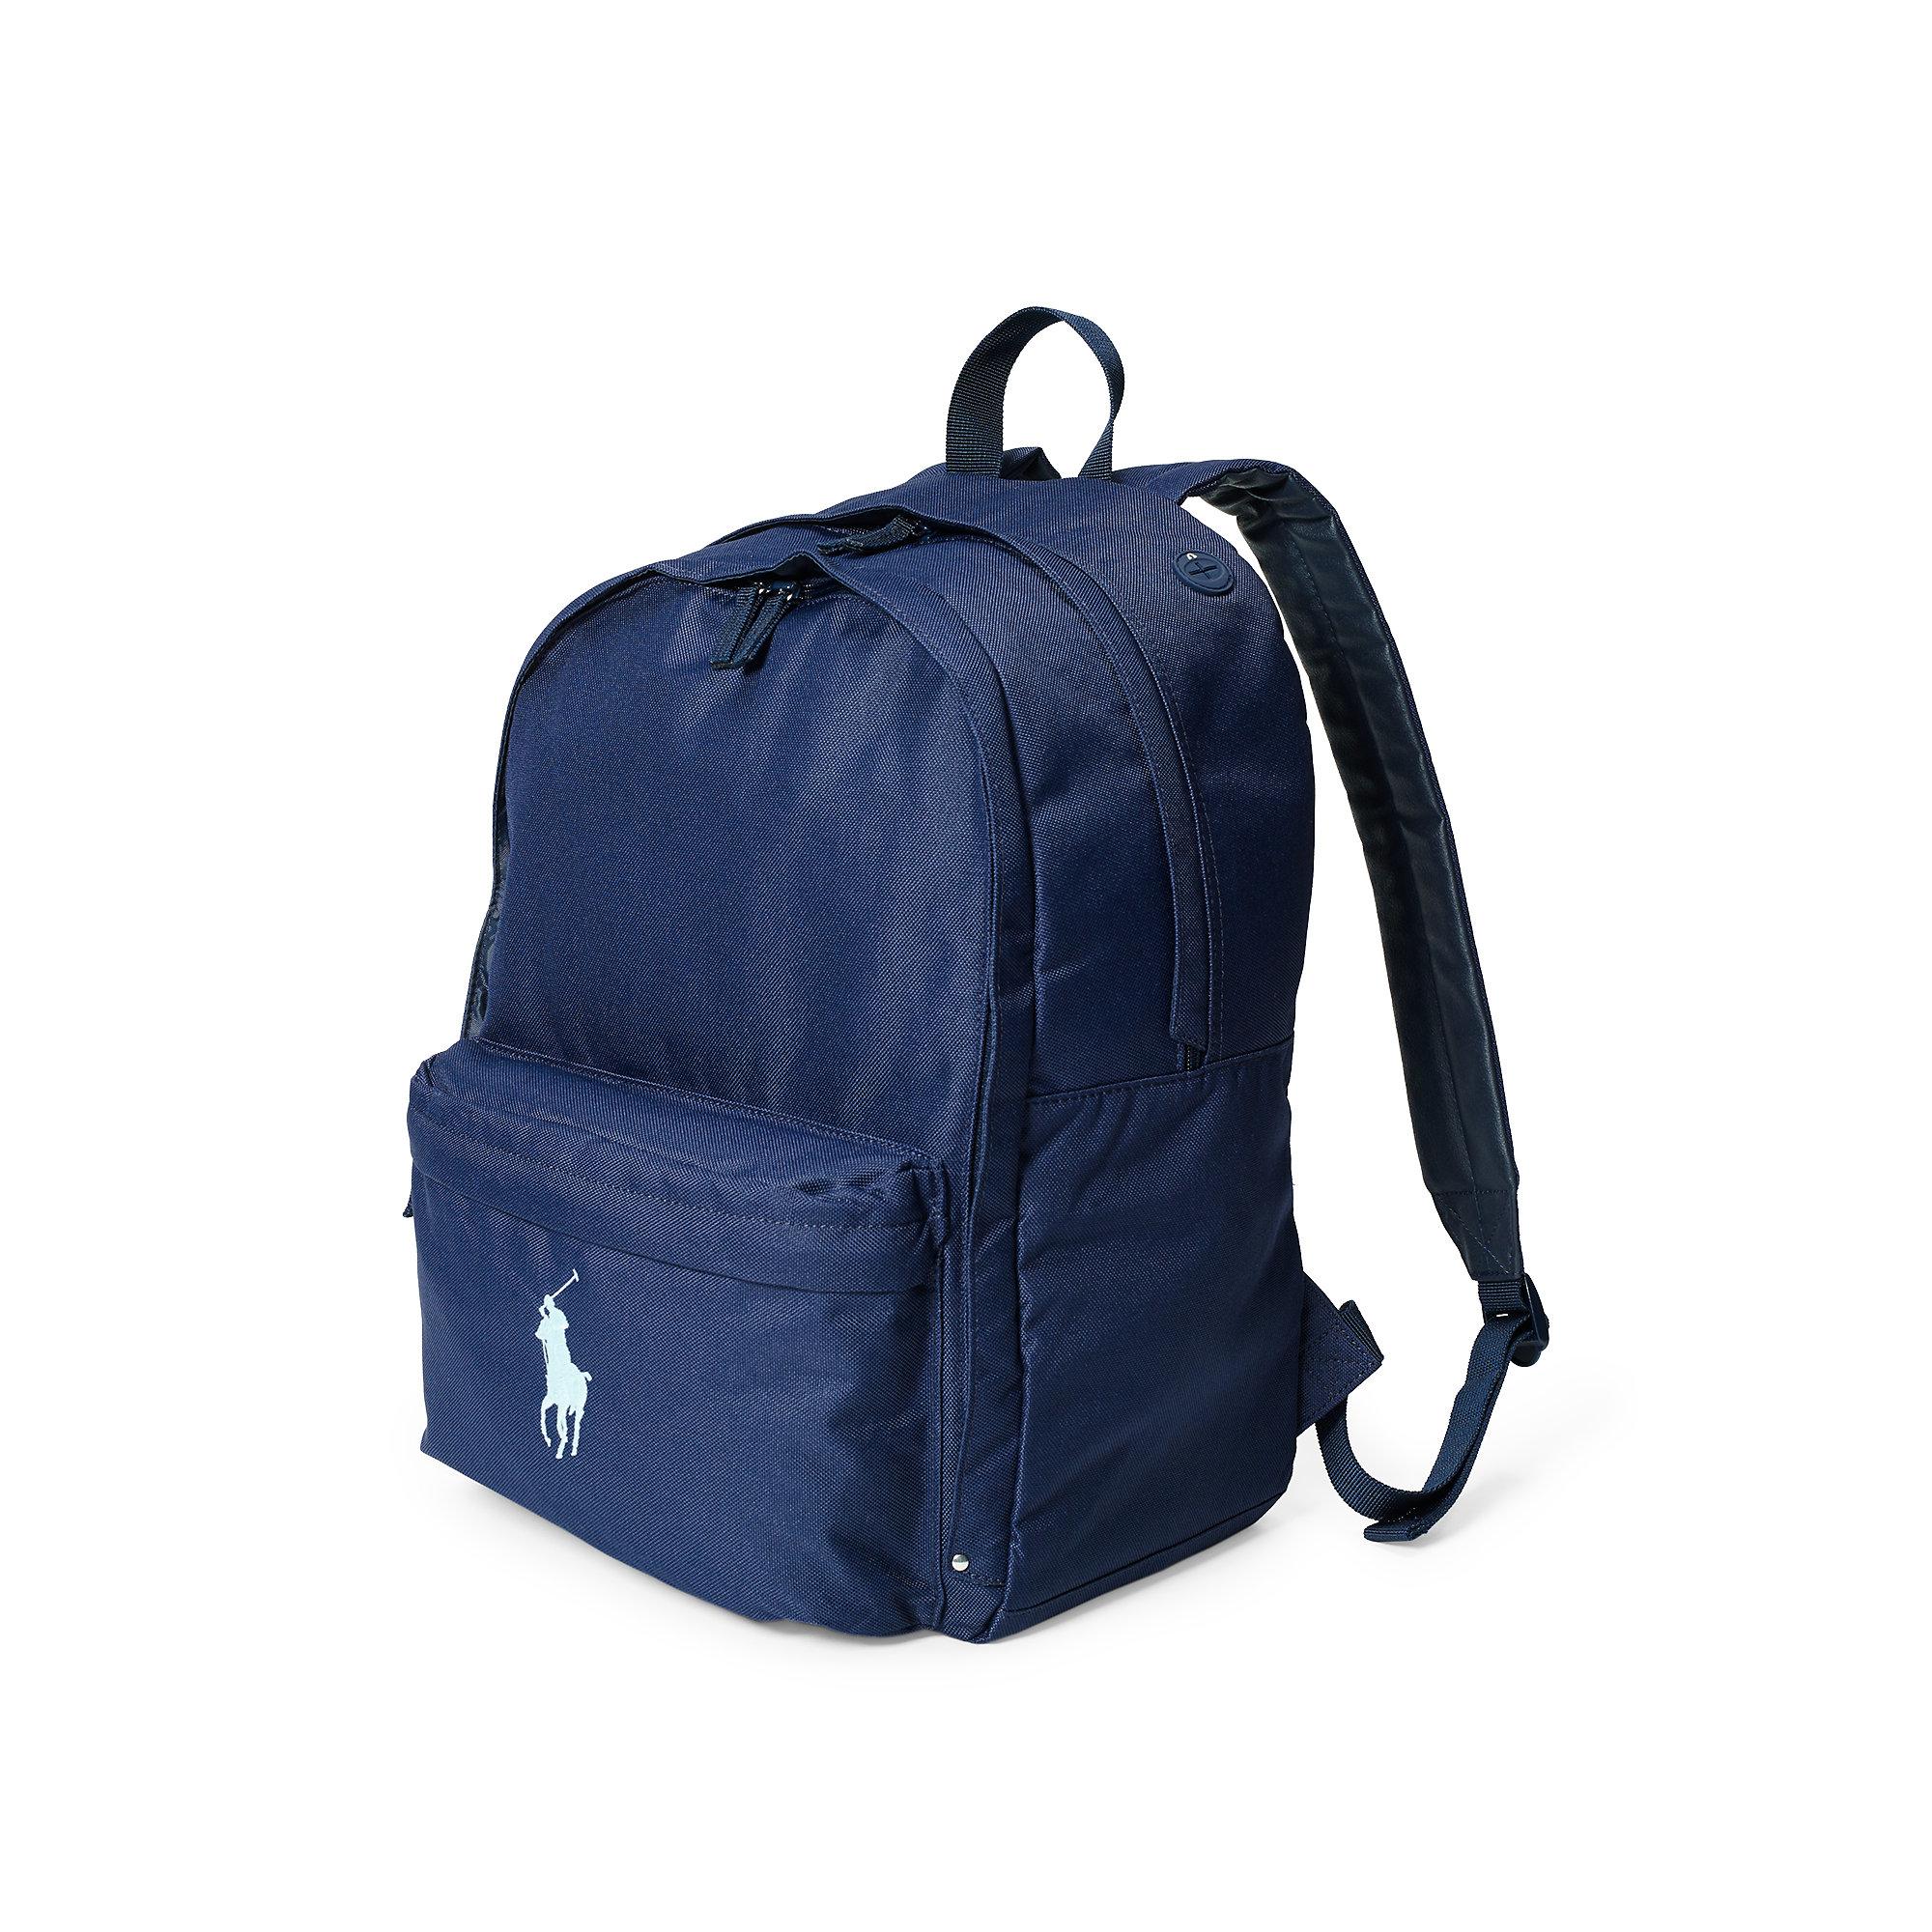 1a7daf30fc Lyst - Ralph Lauren Large Big Pony Backpack in Blue